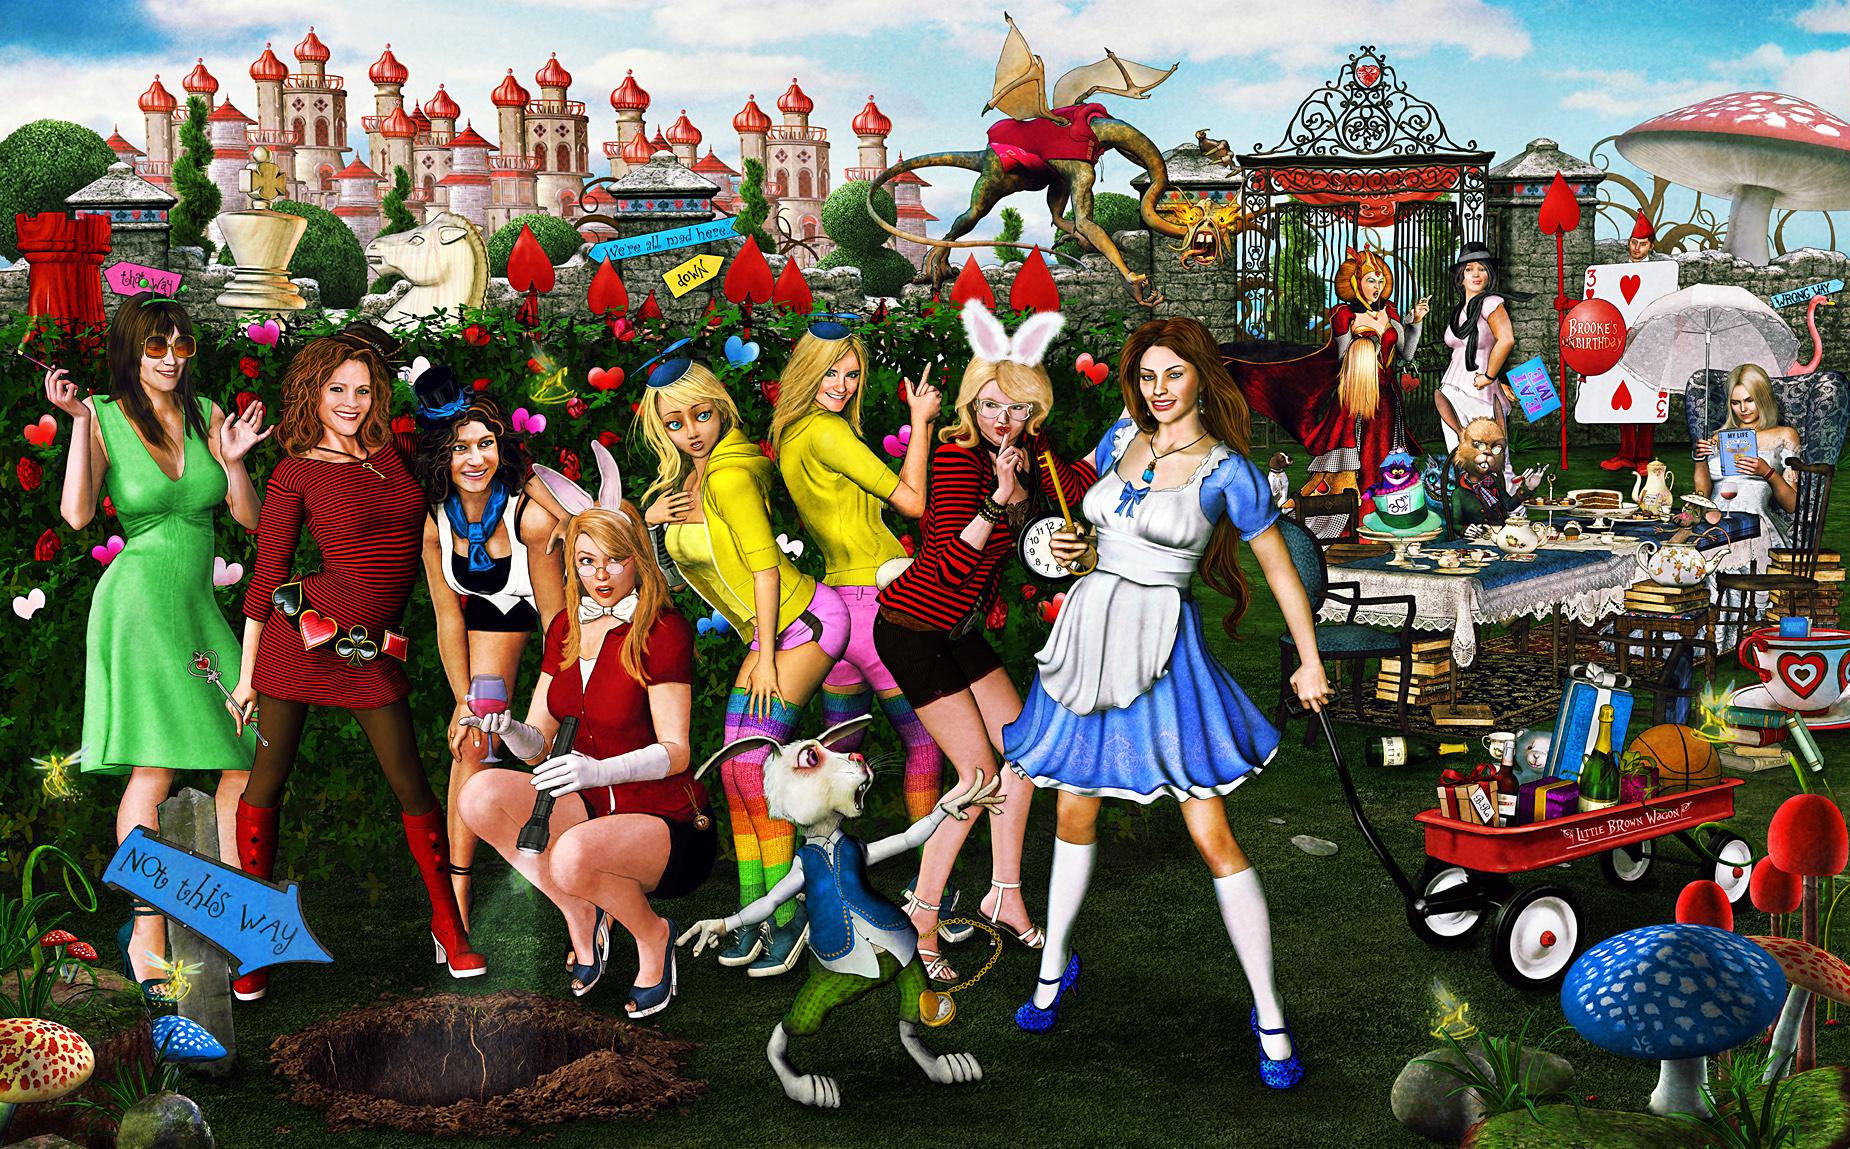 Imposters in Wonderland by alsobroken